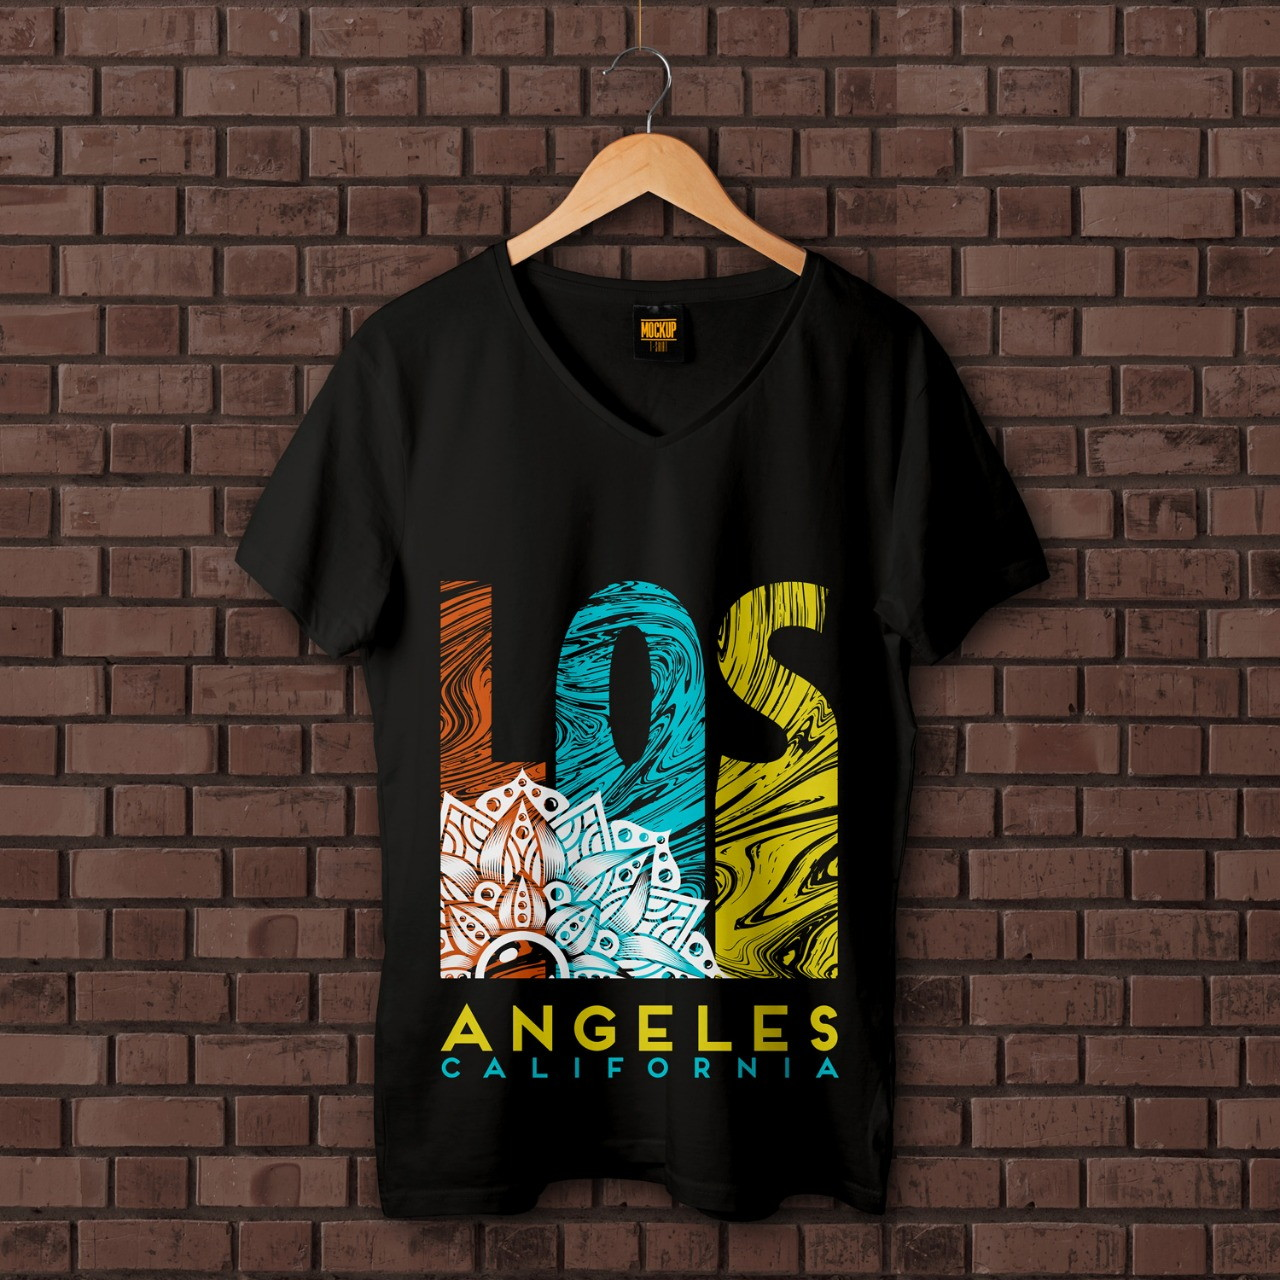 c6dd8724b9 Camisa Termica Feminina Praia